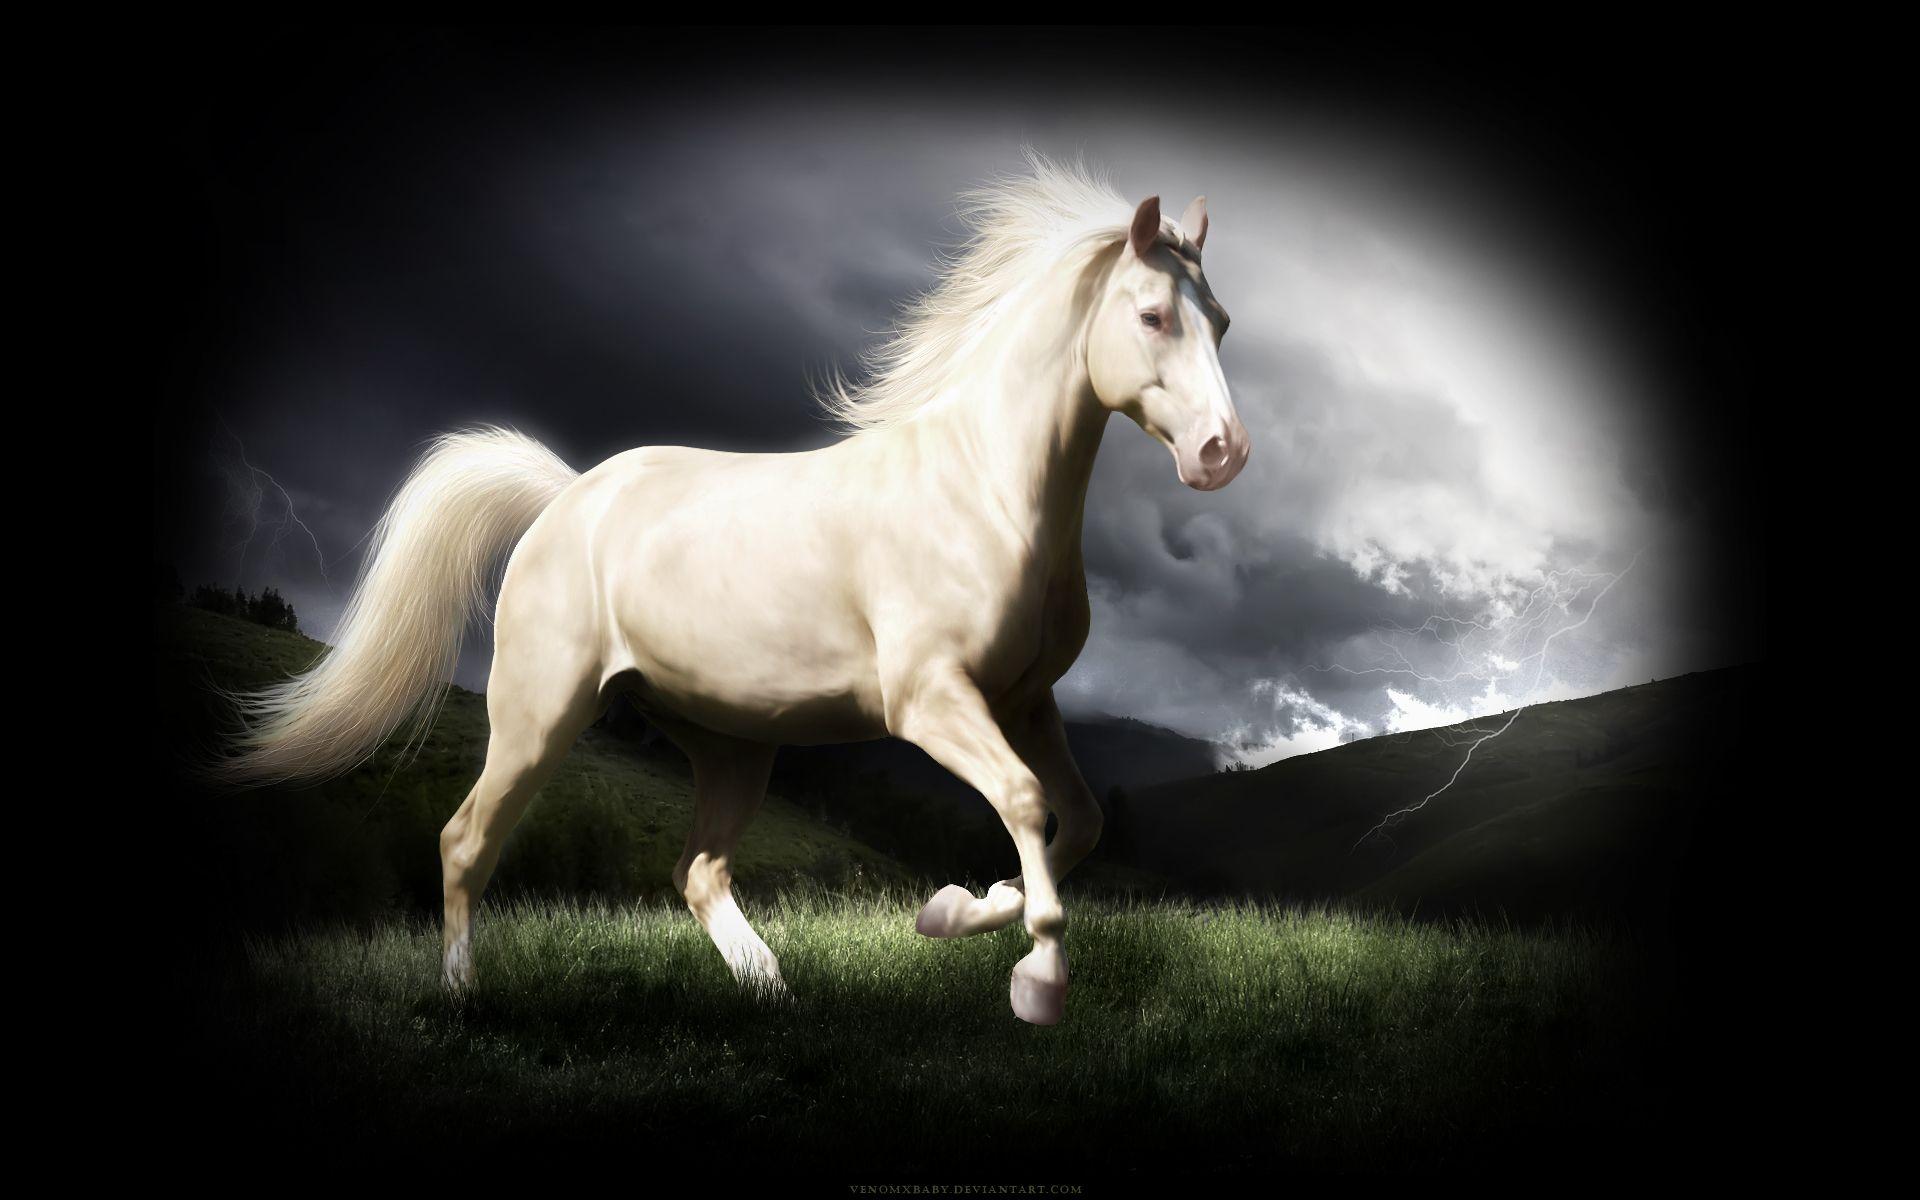 Download Wallpaper Horse Iphone 5s - 228dbe214b625bbee8b6336ee10c75d2  Image_592940.jpg